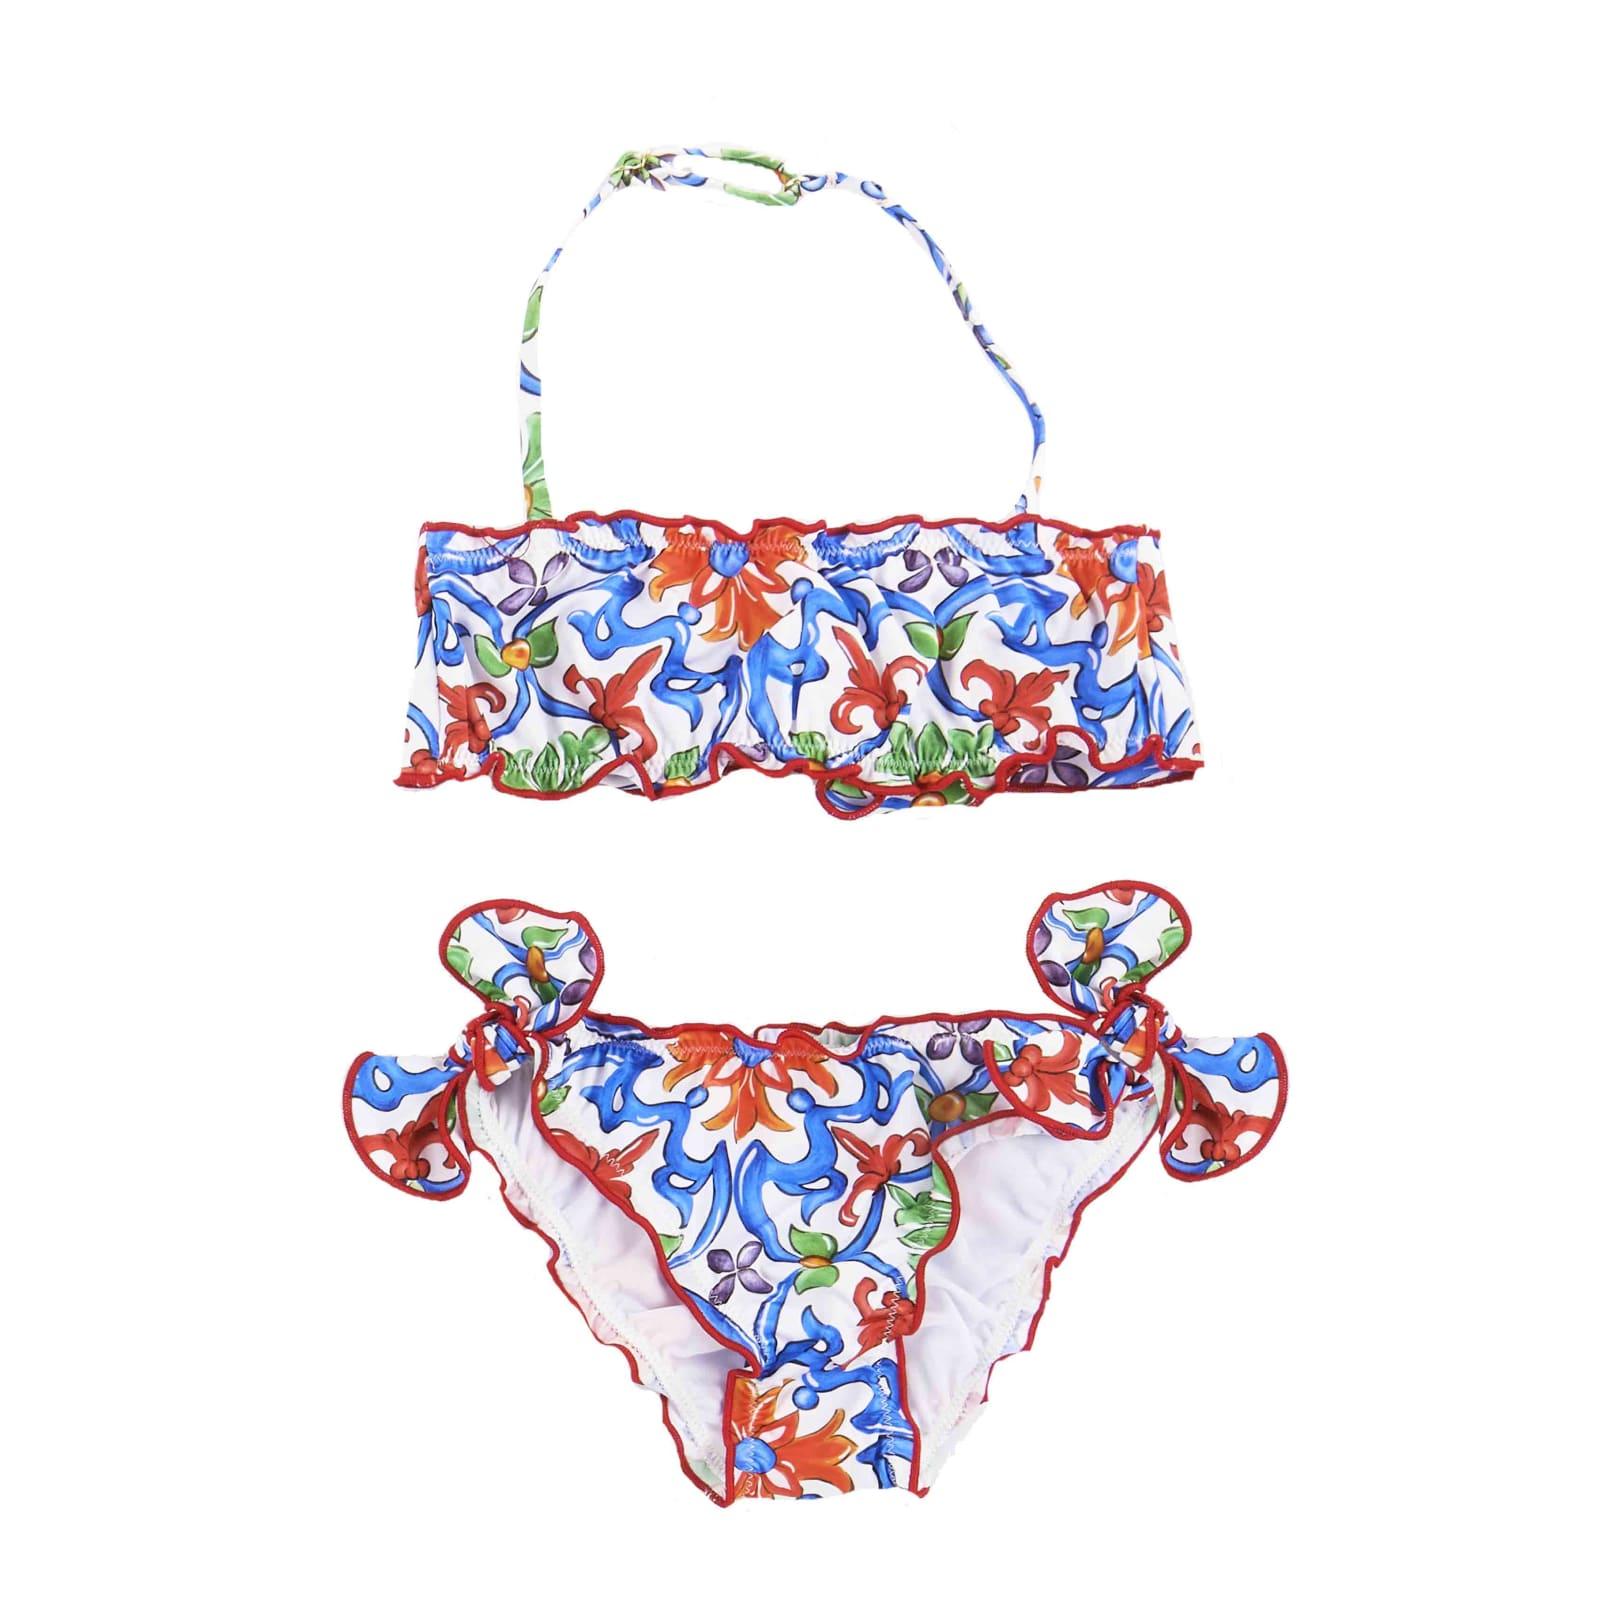 MC2 Saint Barth Maiolica Print Frou Frou Girl Bandeau Bikini